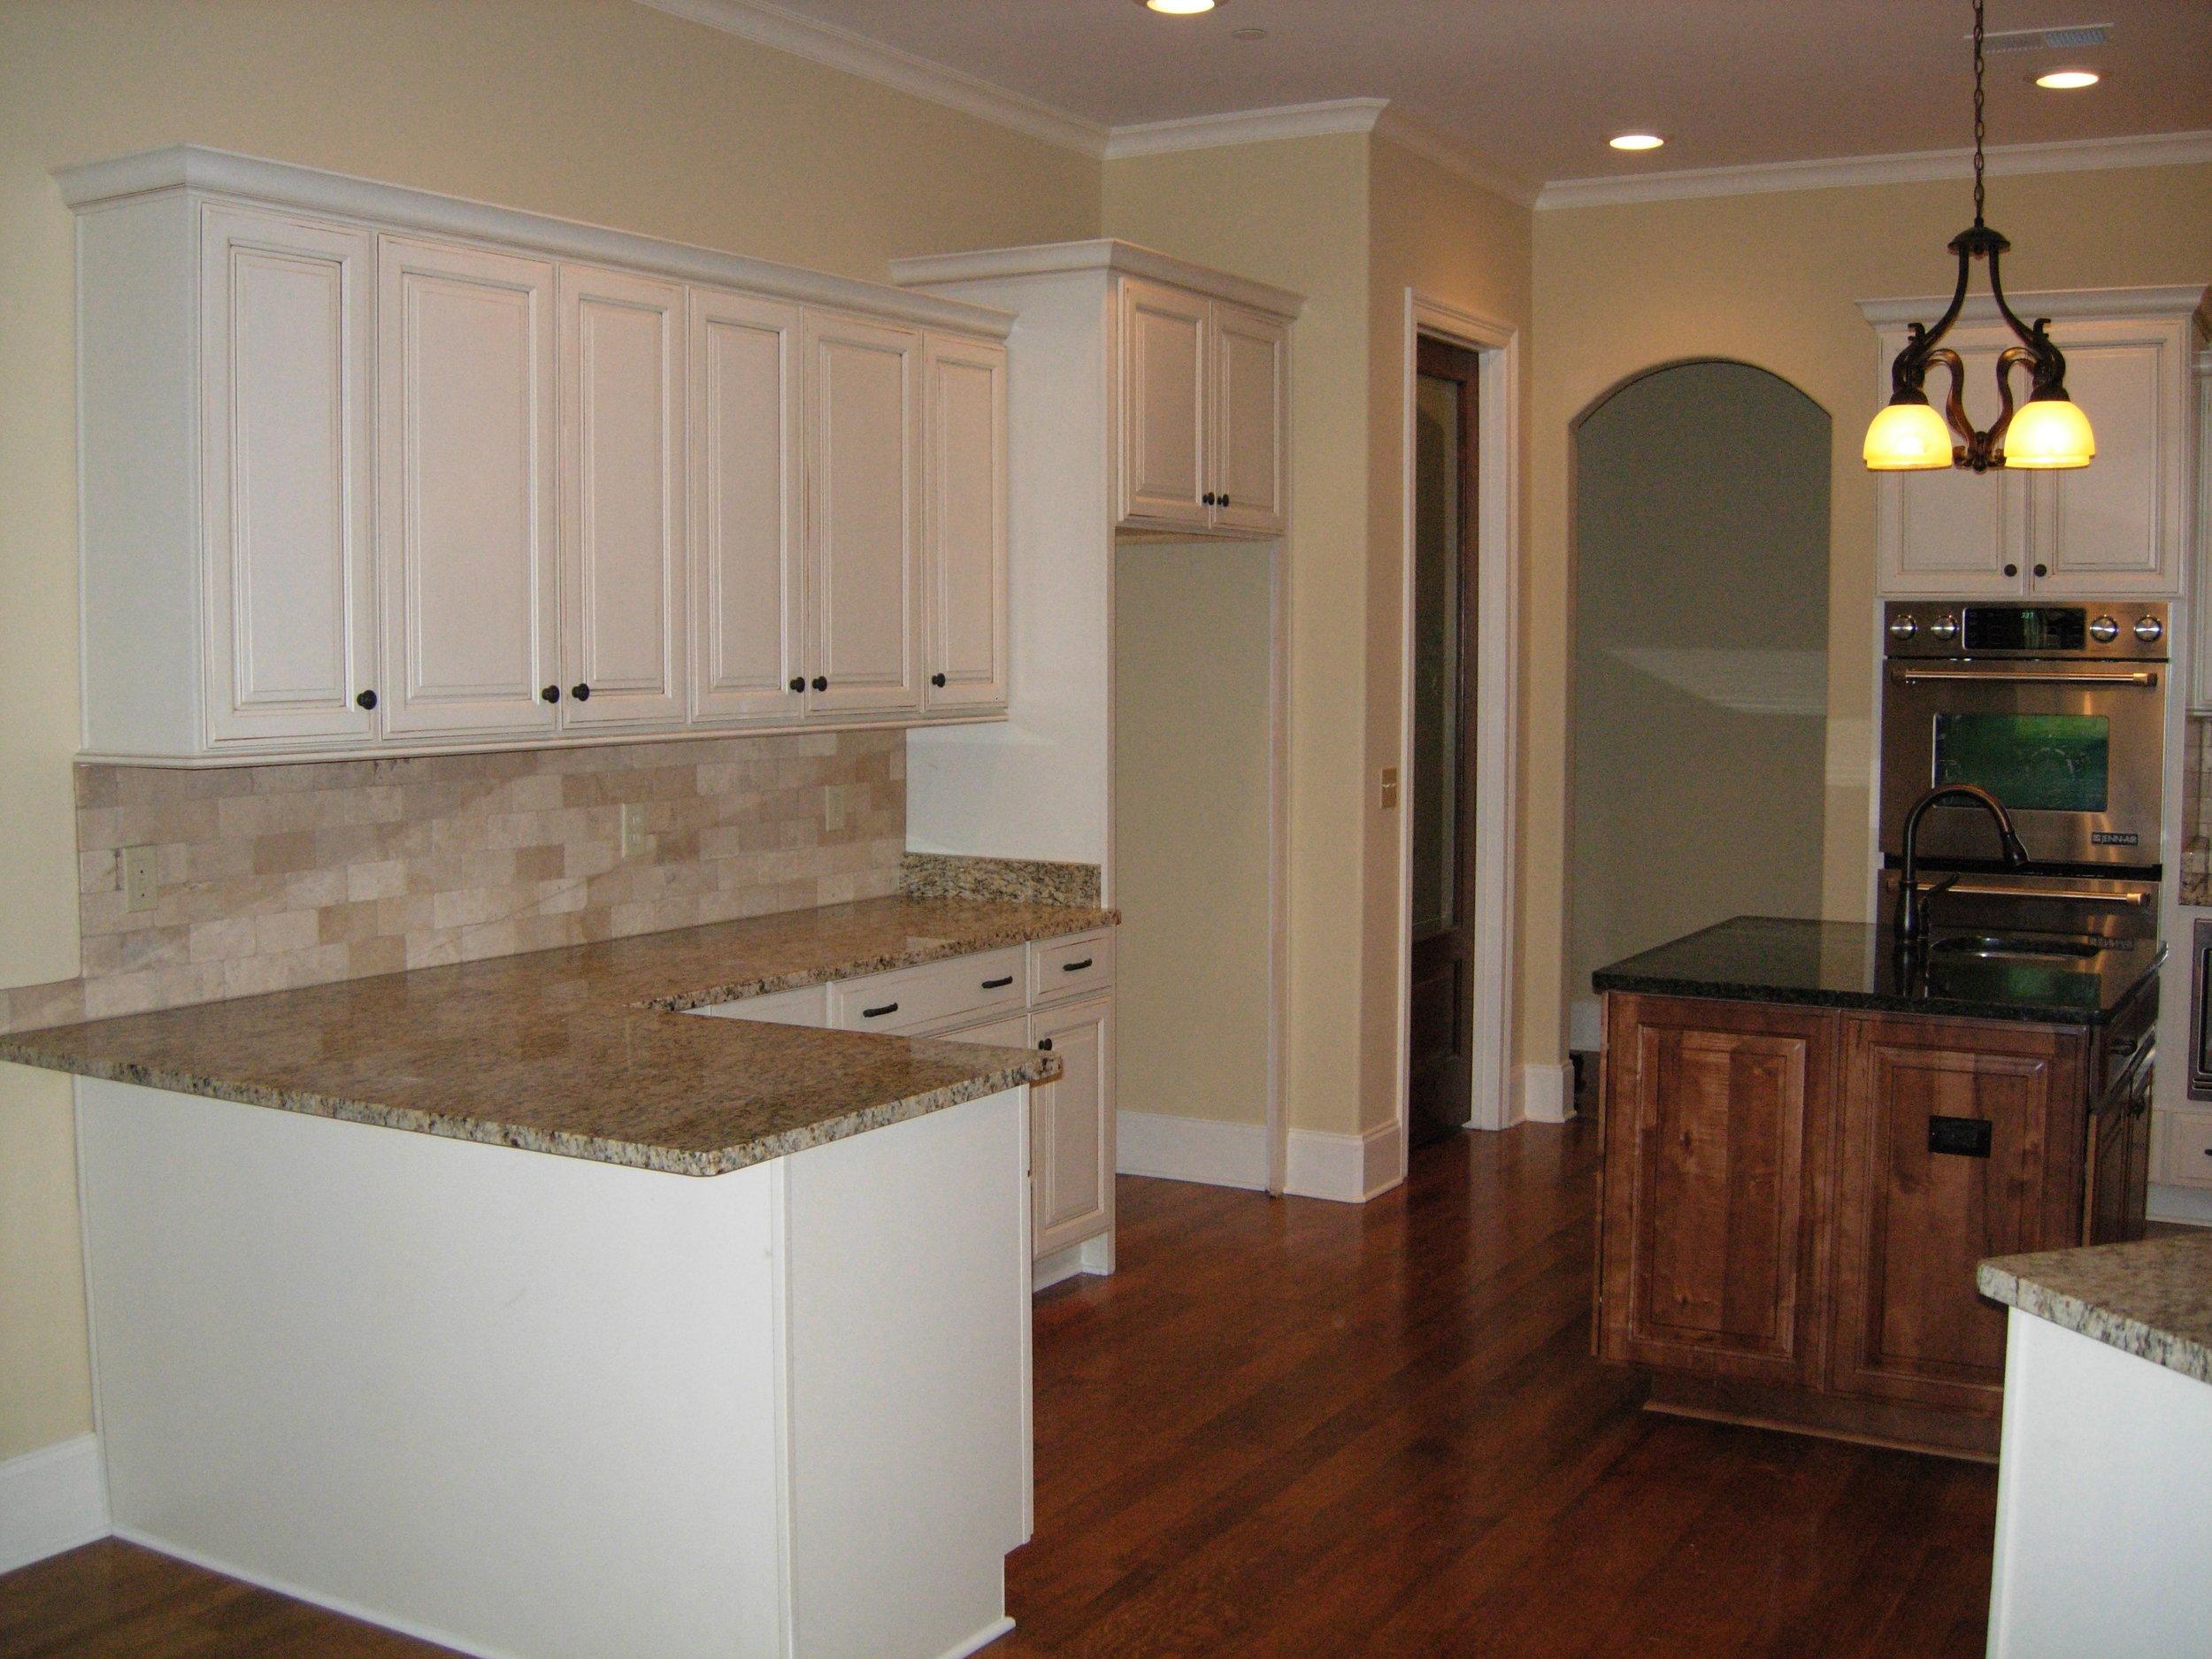 lot47-kitchen2.jpg